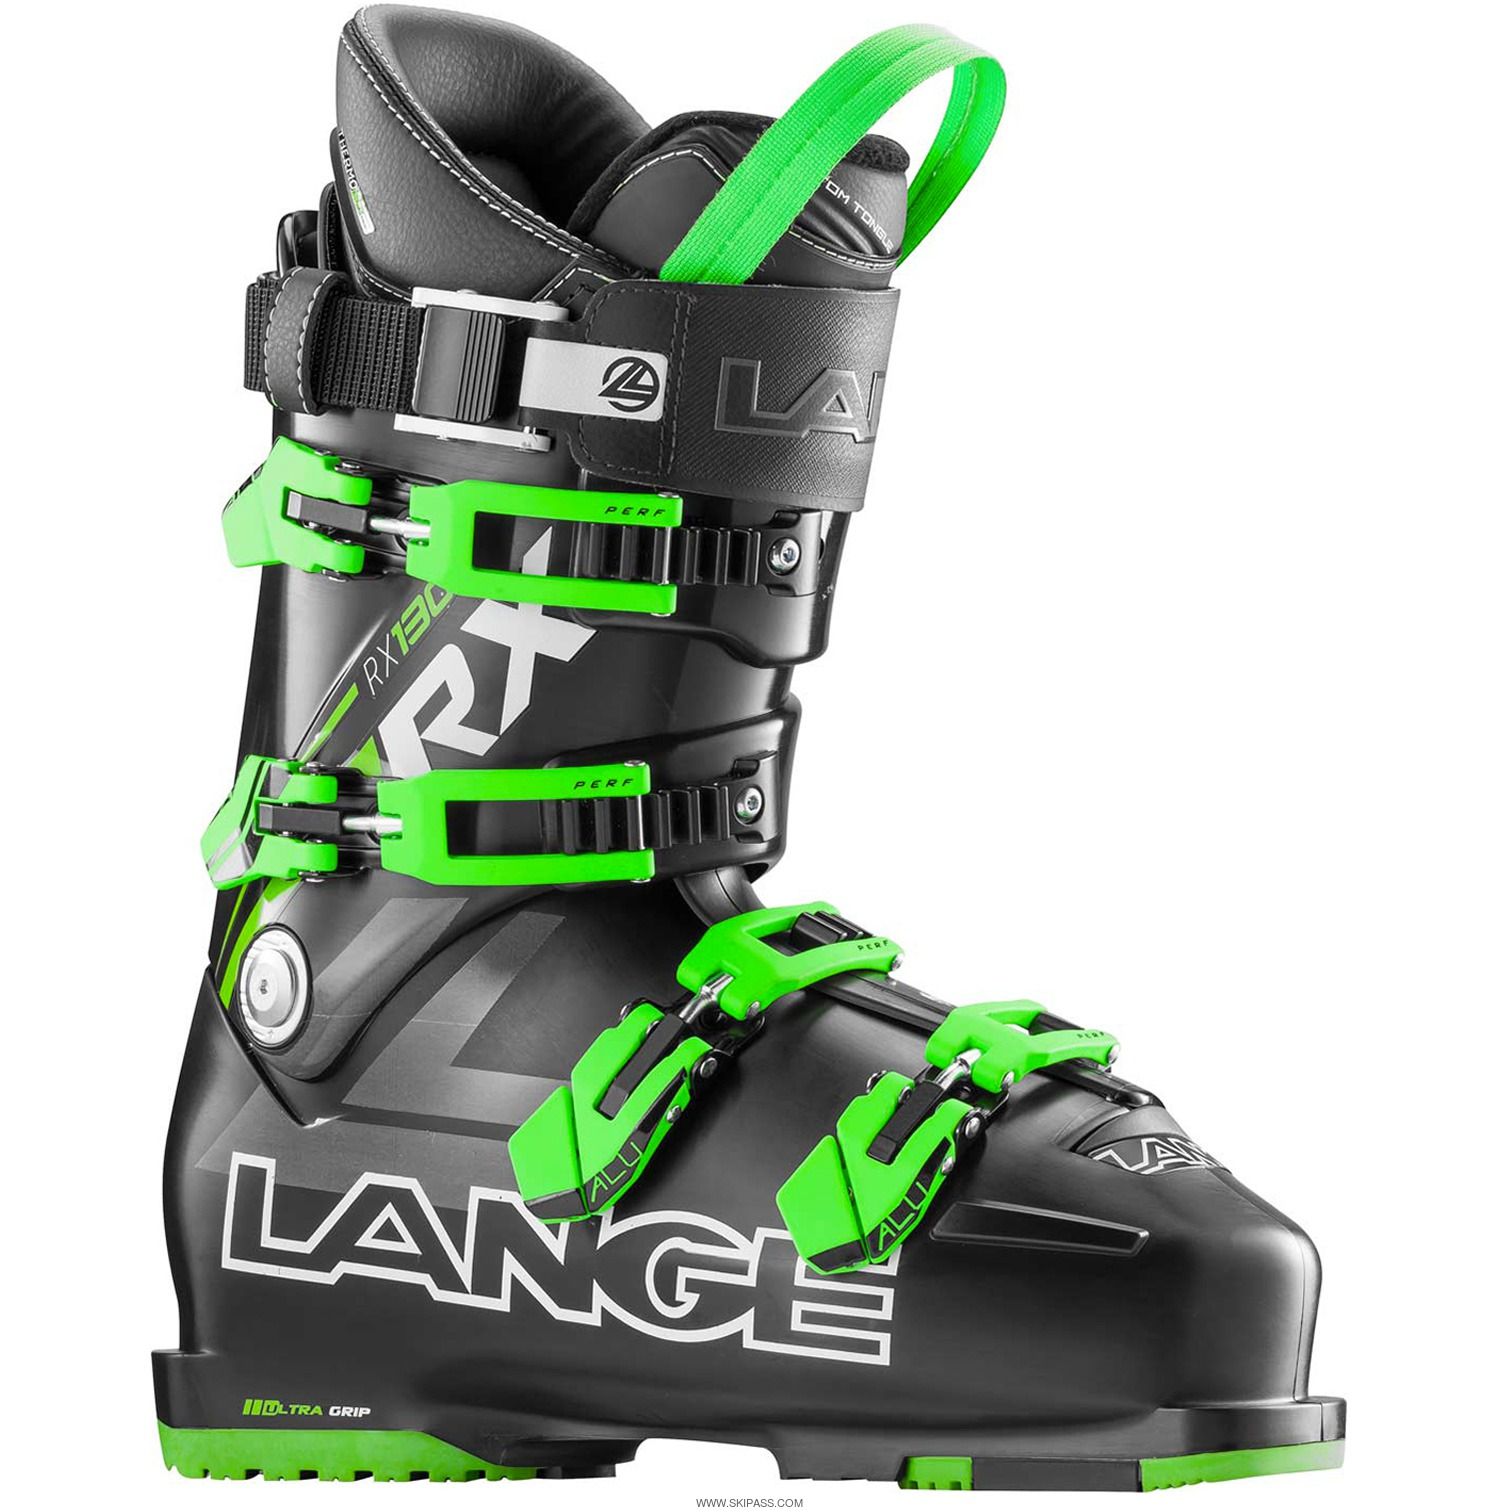 Marque De De Ski Marque Ski Chaussure Marque Chaussure De edCBox